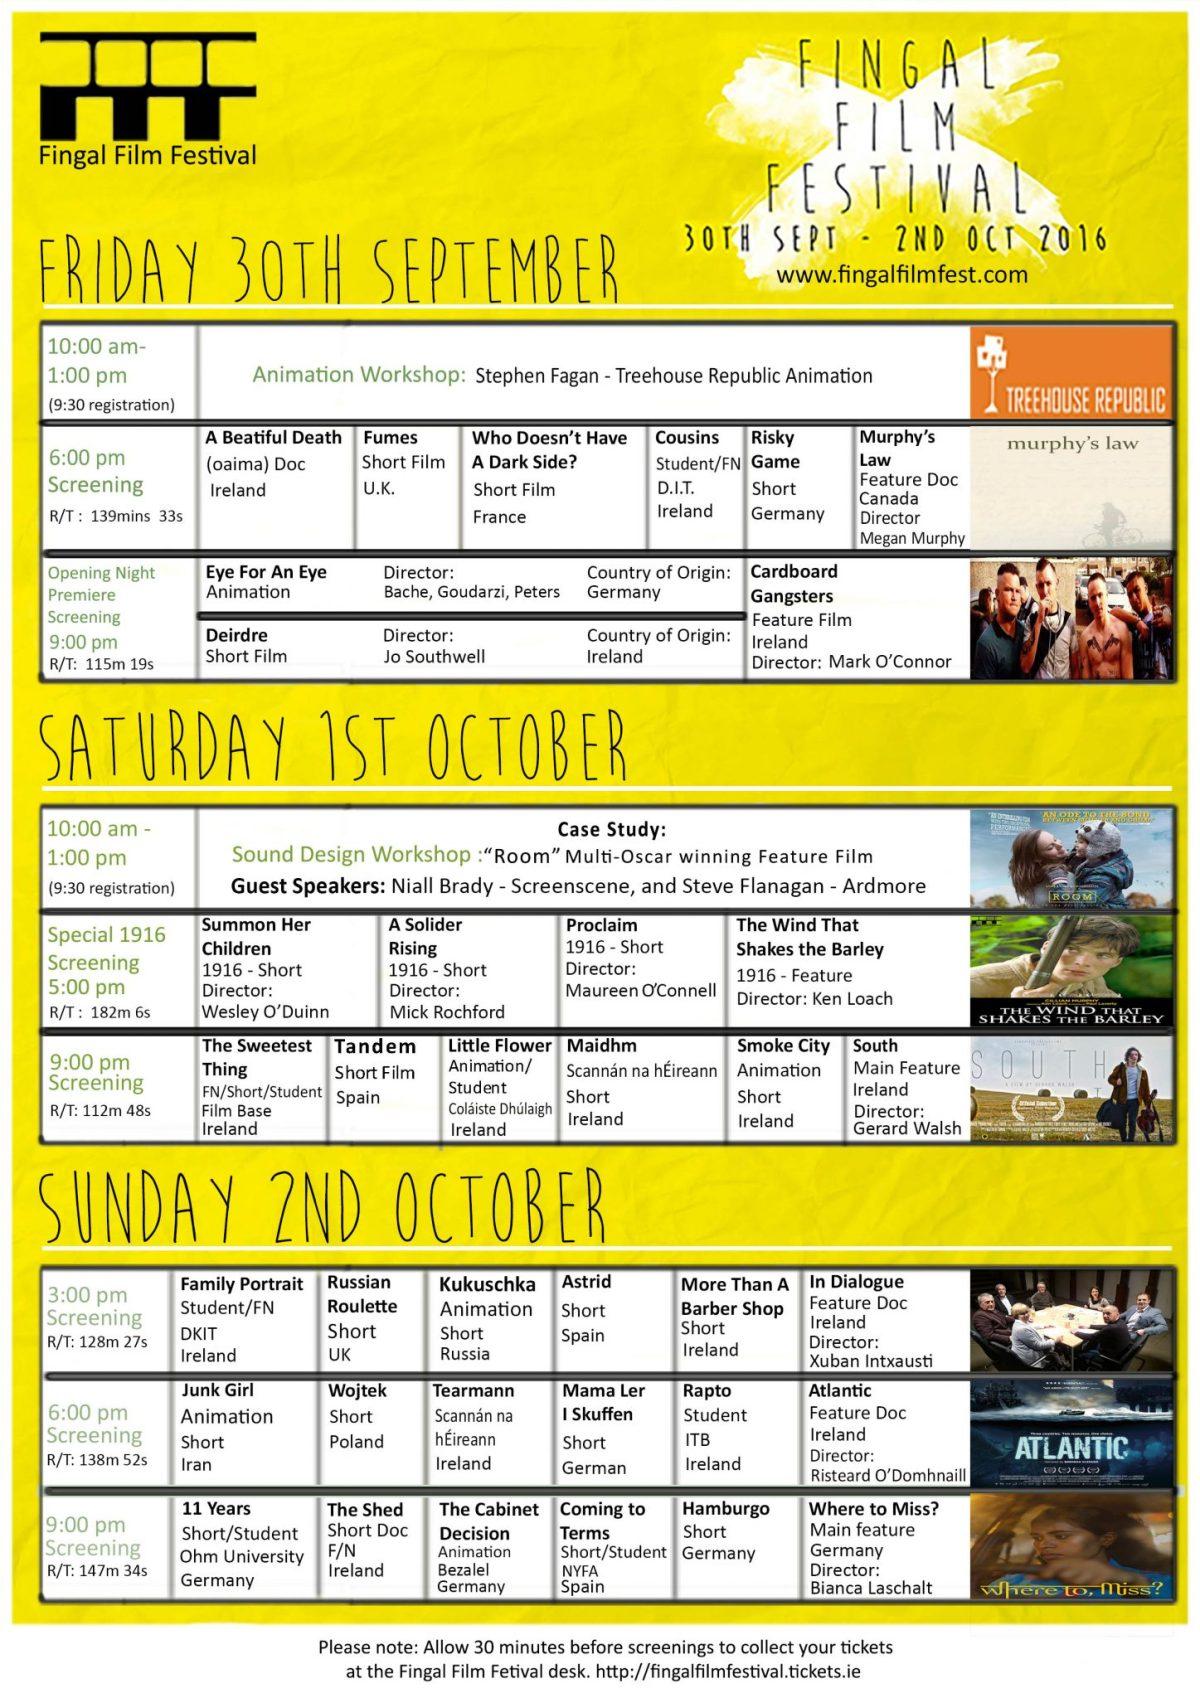 Fingal Film Festival 2016 Line-Up